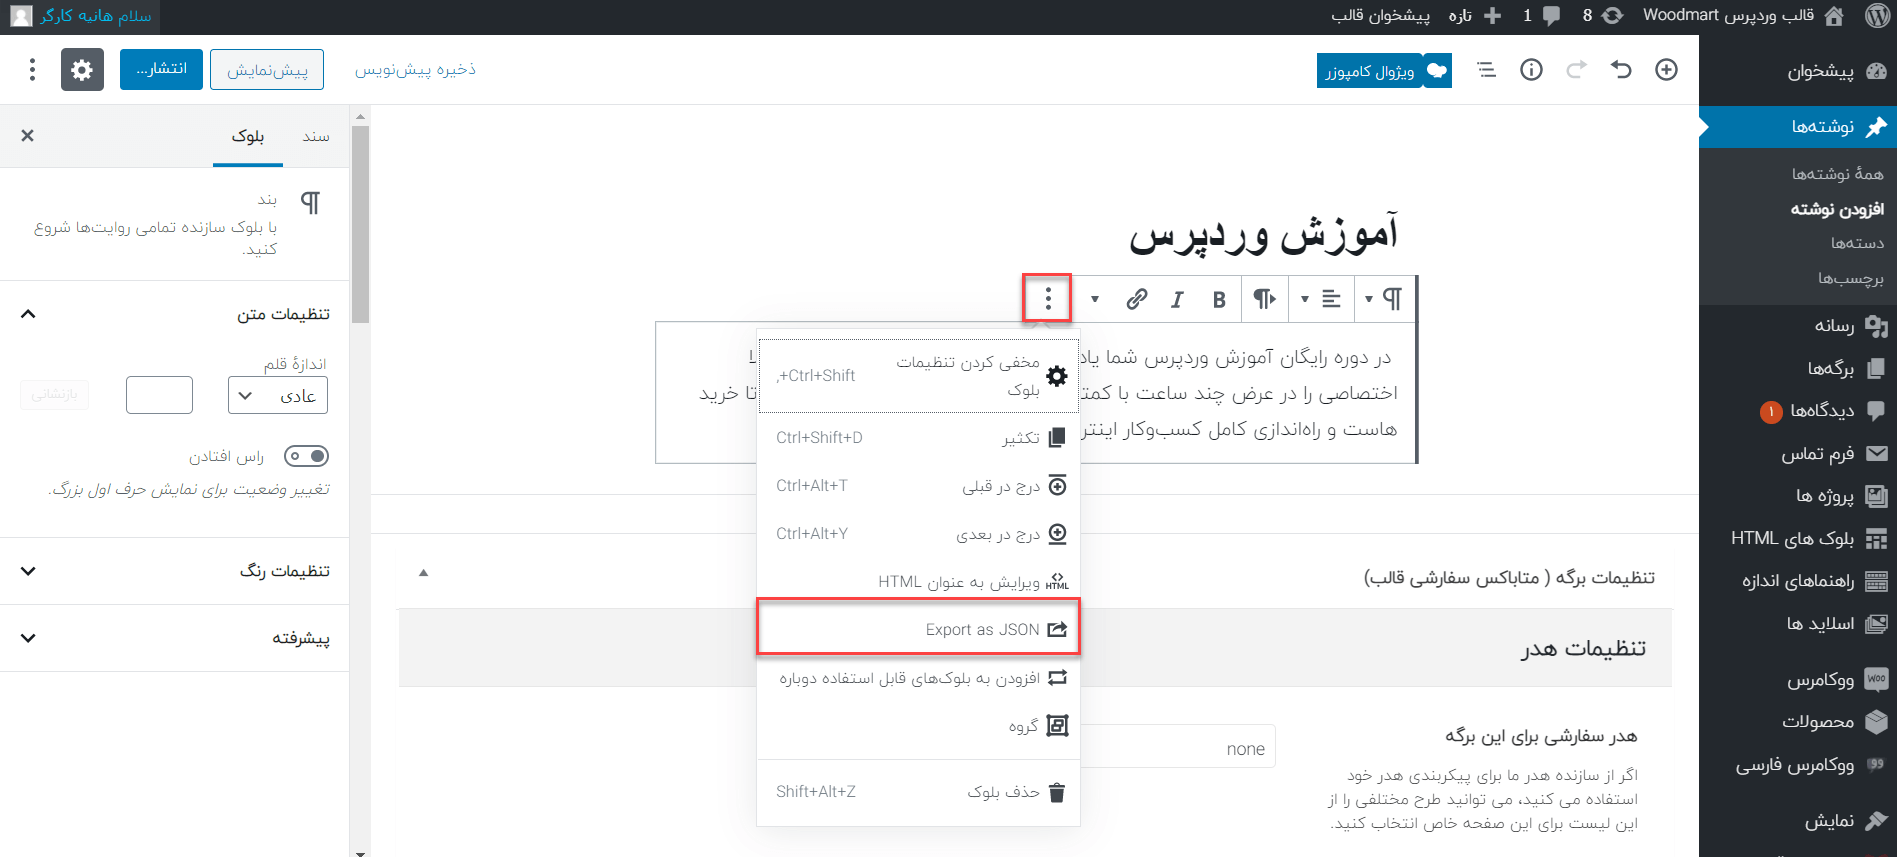 Export as JSON 2 1